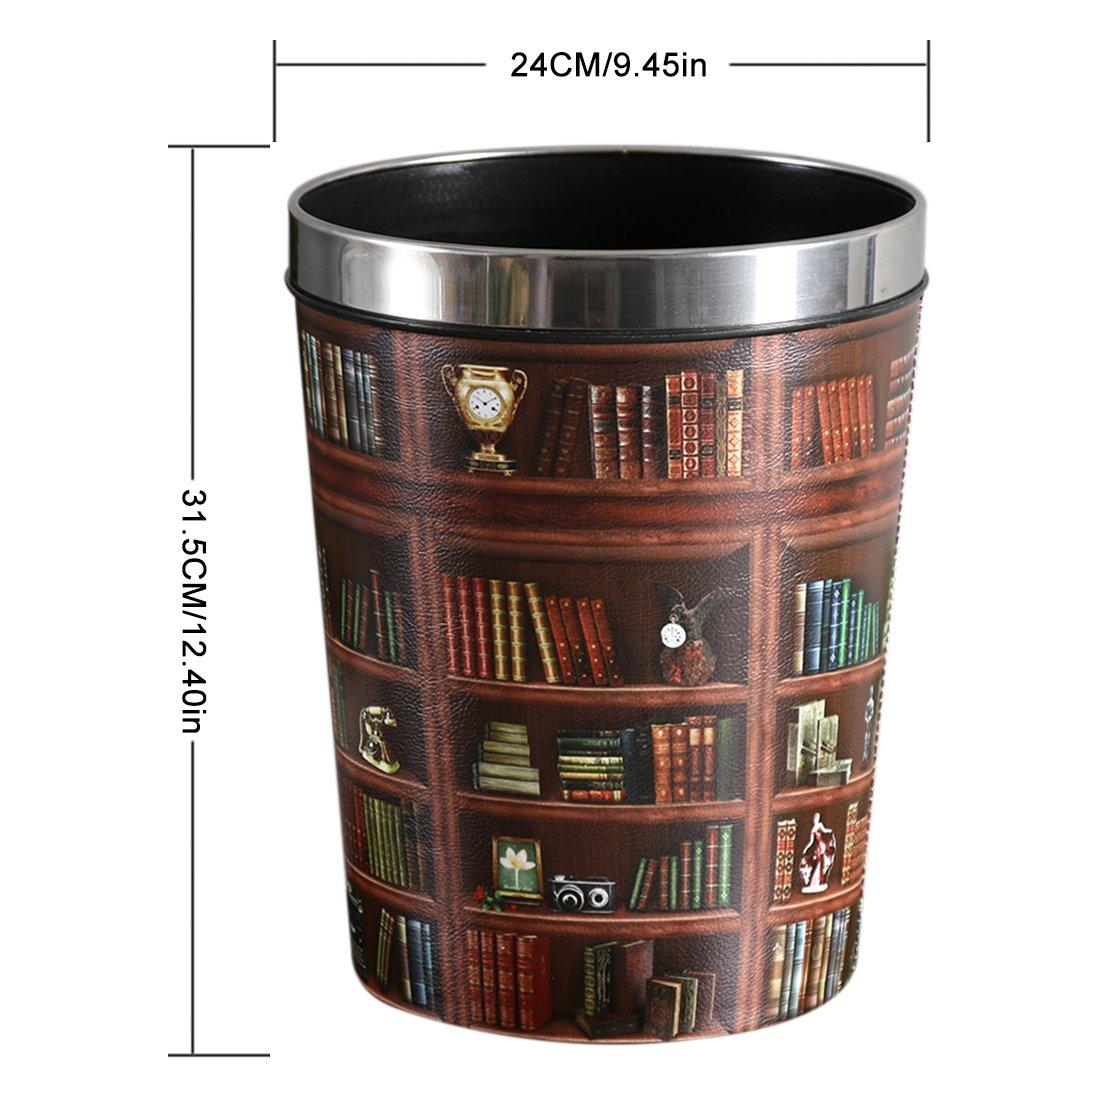 Giplar - Papelera clásico de piel sintética, 12 L, diseño clásico Papelera 24x24x31,5cm Bookcase Pattern 9f2faf